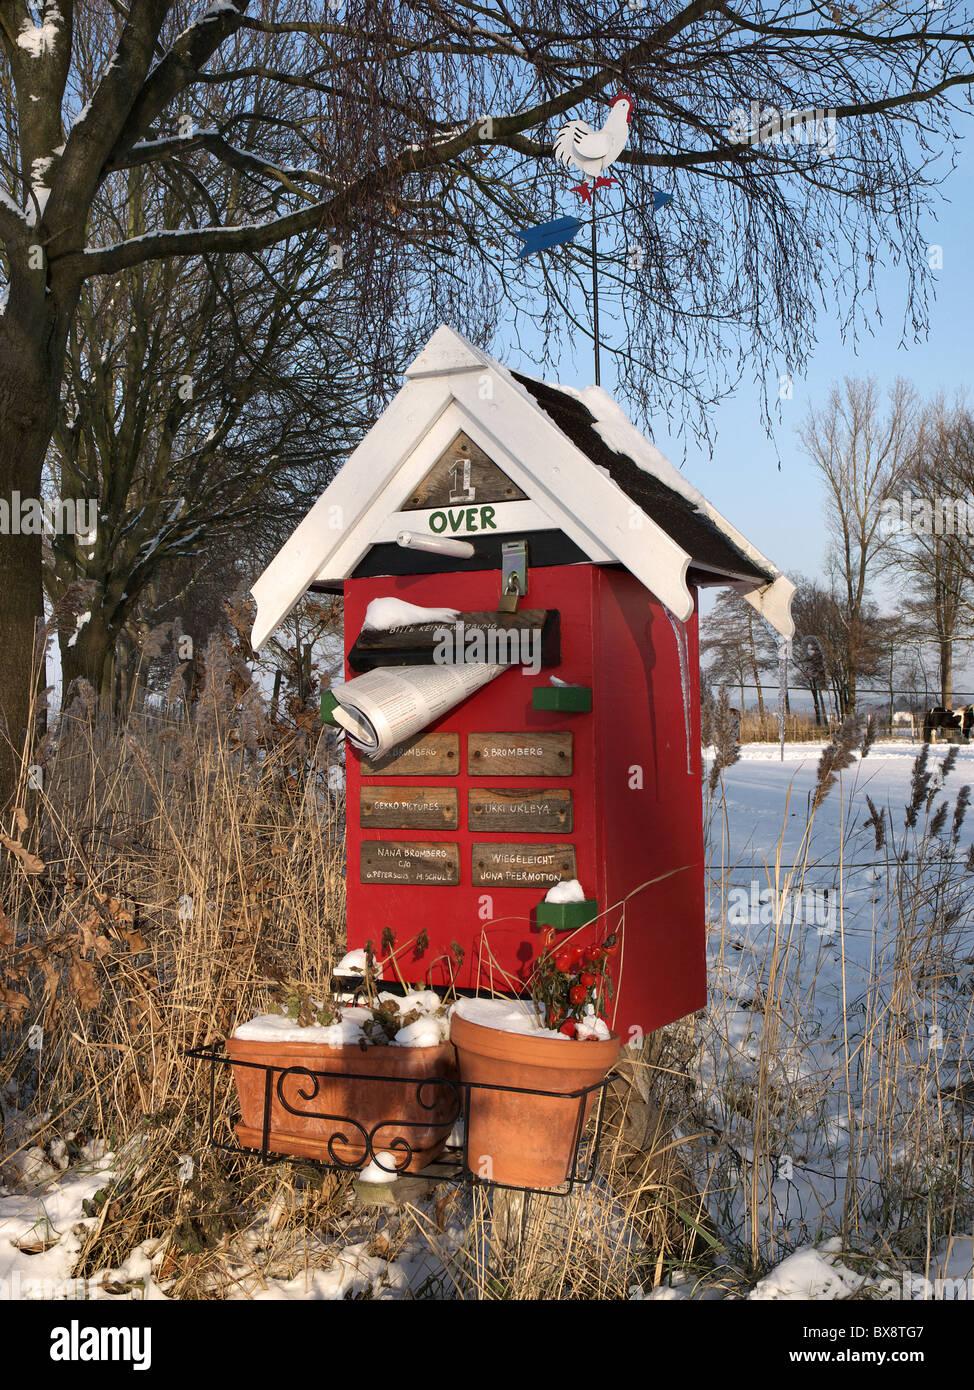 Funny mailbox at a farm in Barum, Elbmarsch, Niedersachsen, Germany. - Stock Image